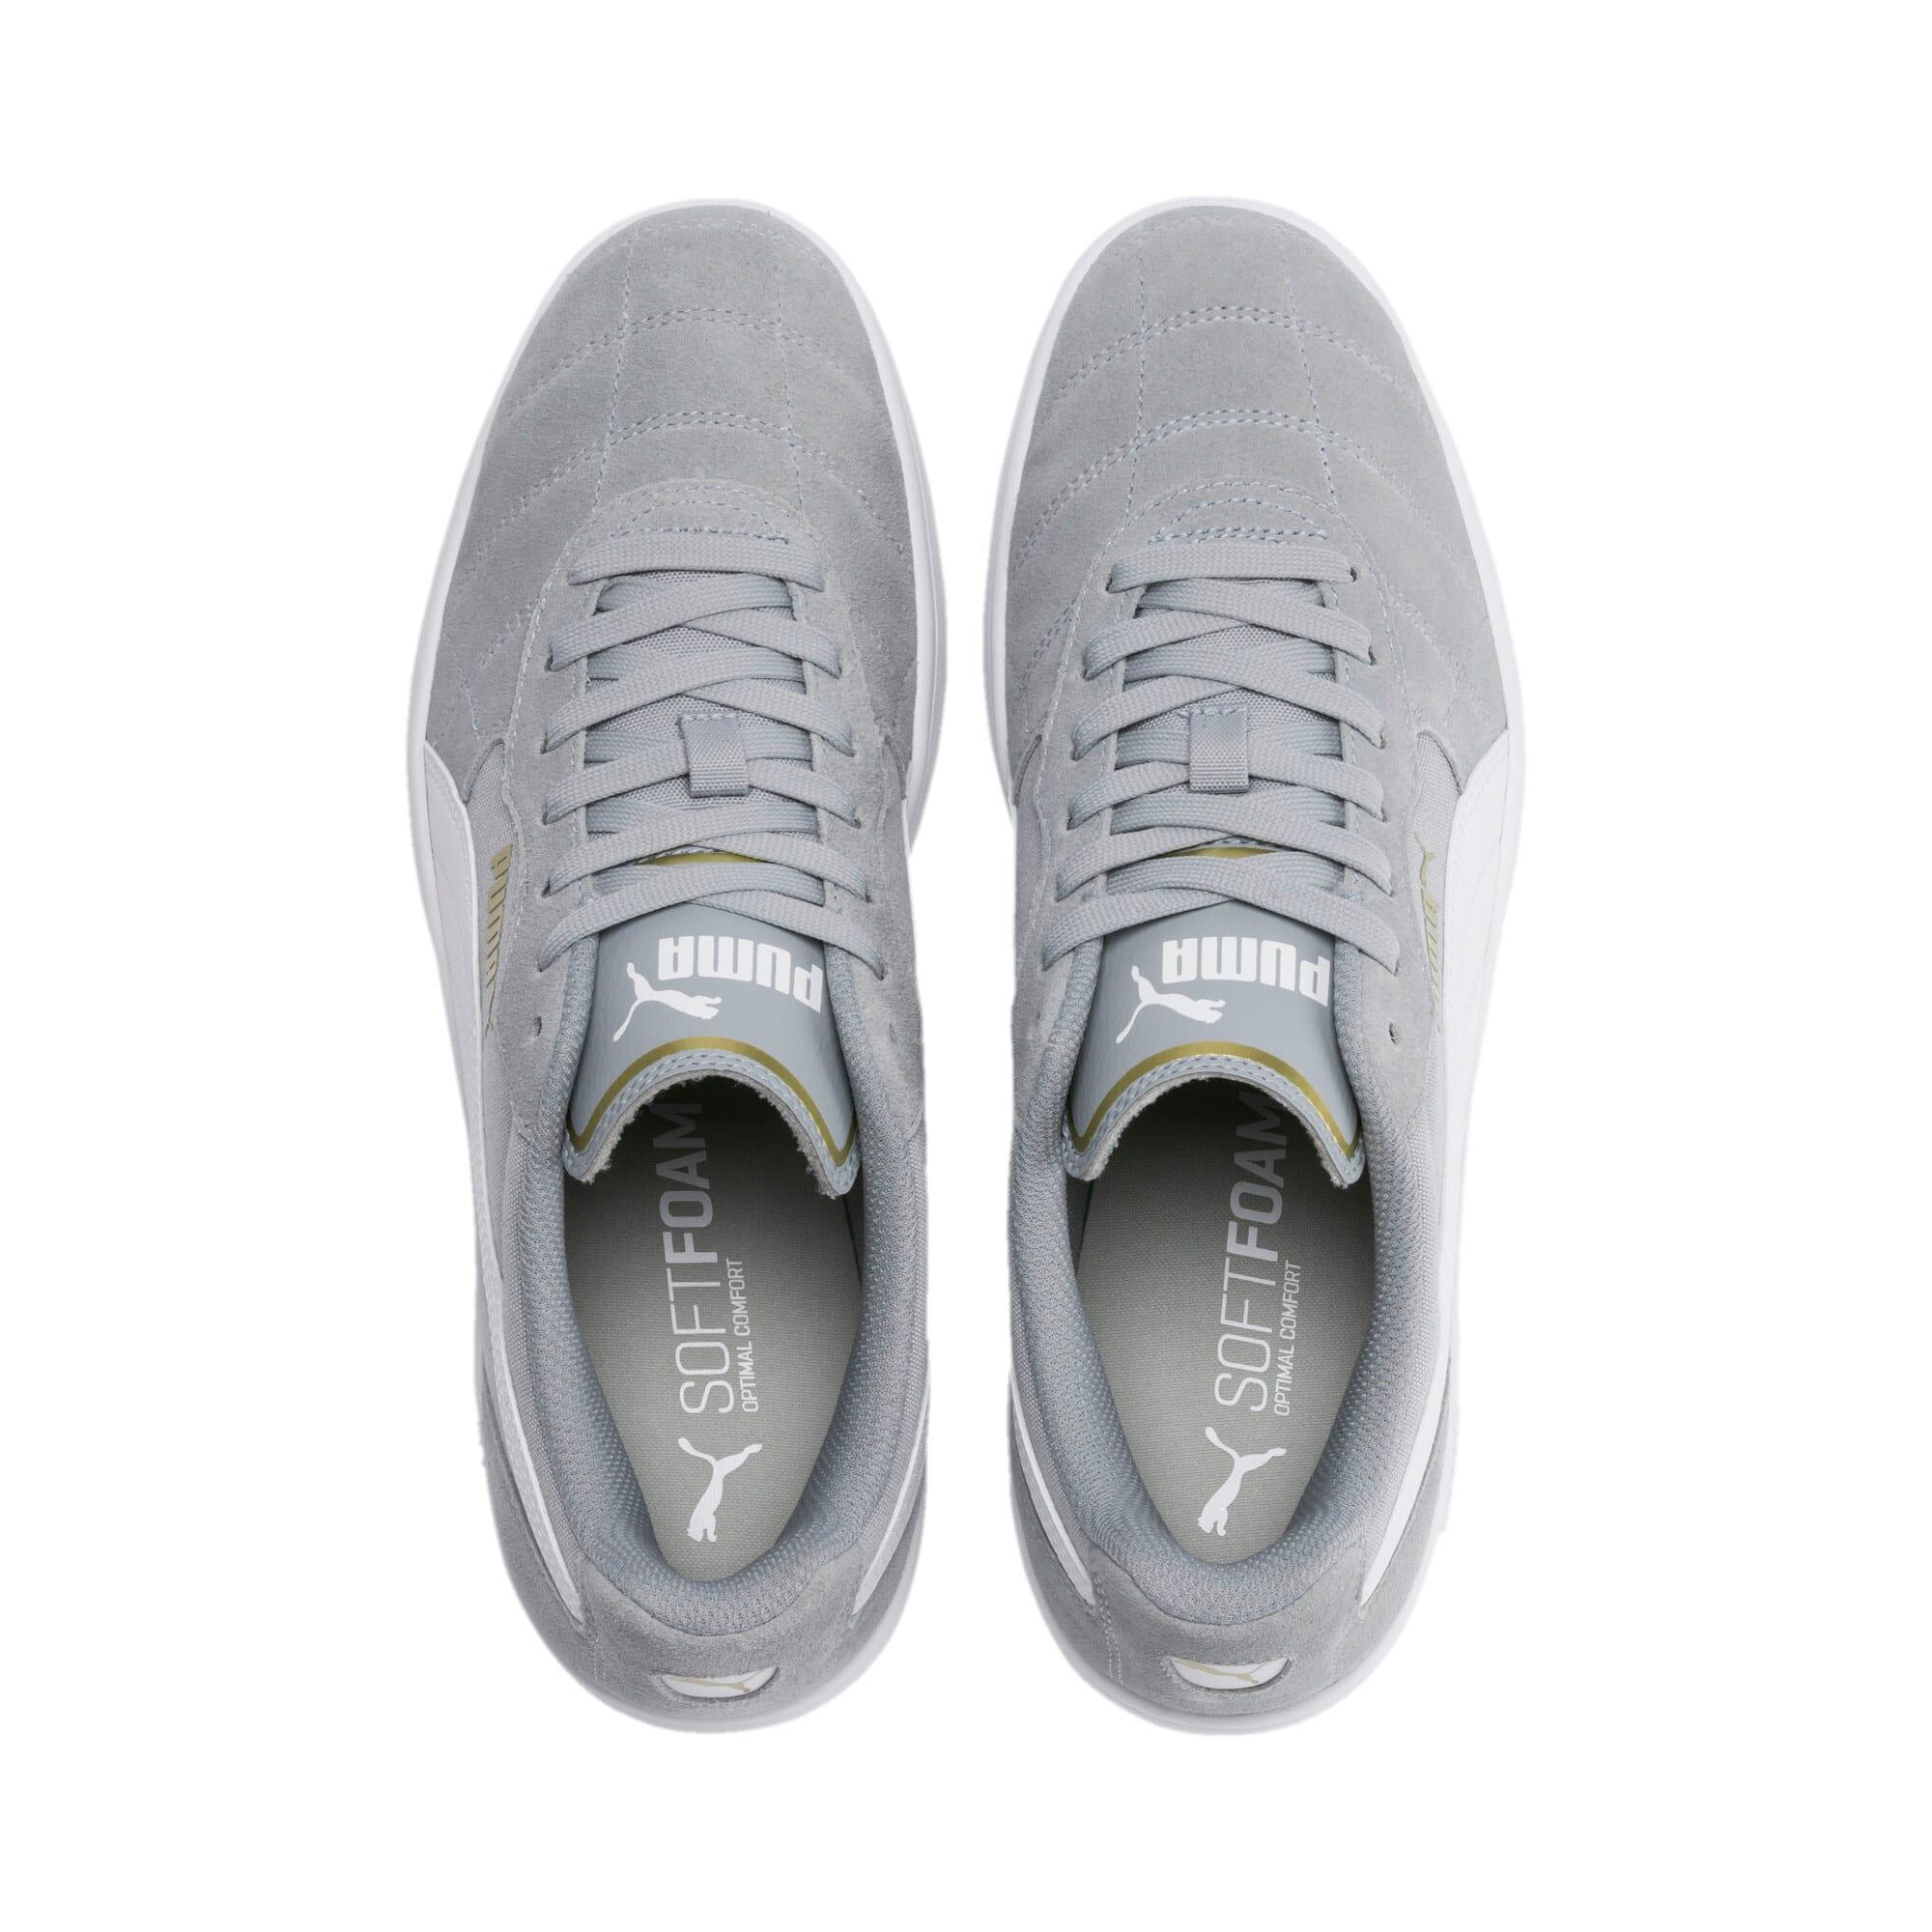 Thumbnail 7 of Astro Kick Sneakers, High Rise-Puma White-Gold, medium